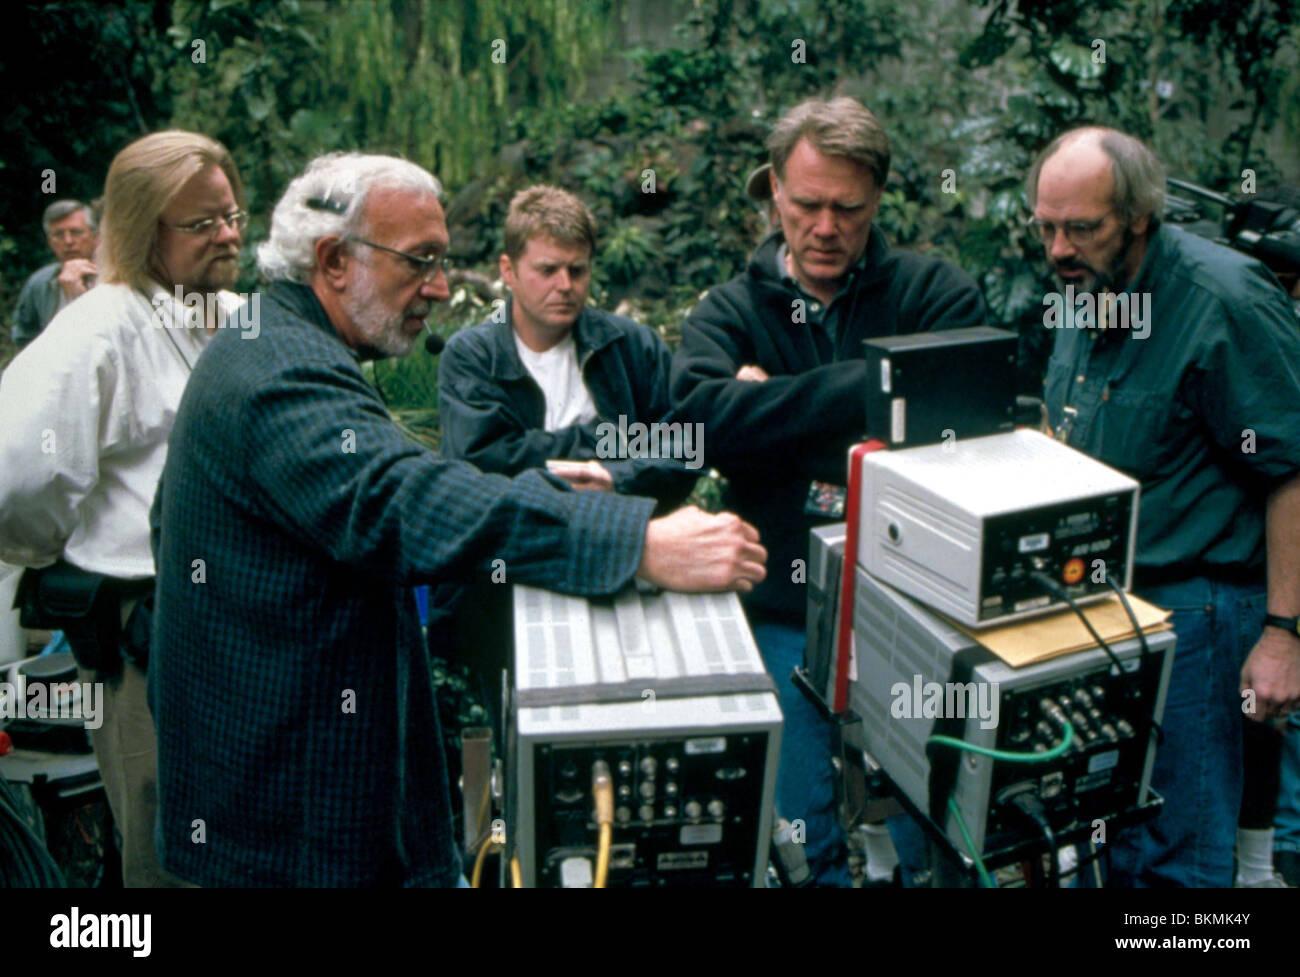 FILMING ON SET (ALT) O/S 'JURASSIC PARK III' (2001) JURASSIC PARK 3 (ALT) WITH STAN WINSTON (CINE) FILM - Stock Image